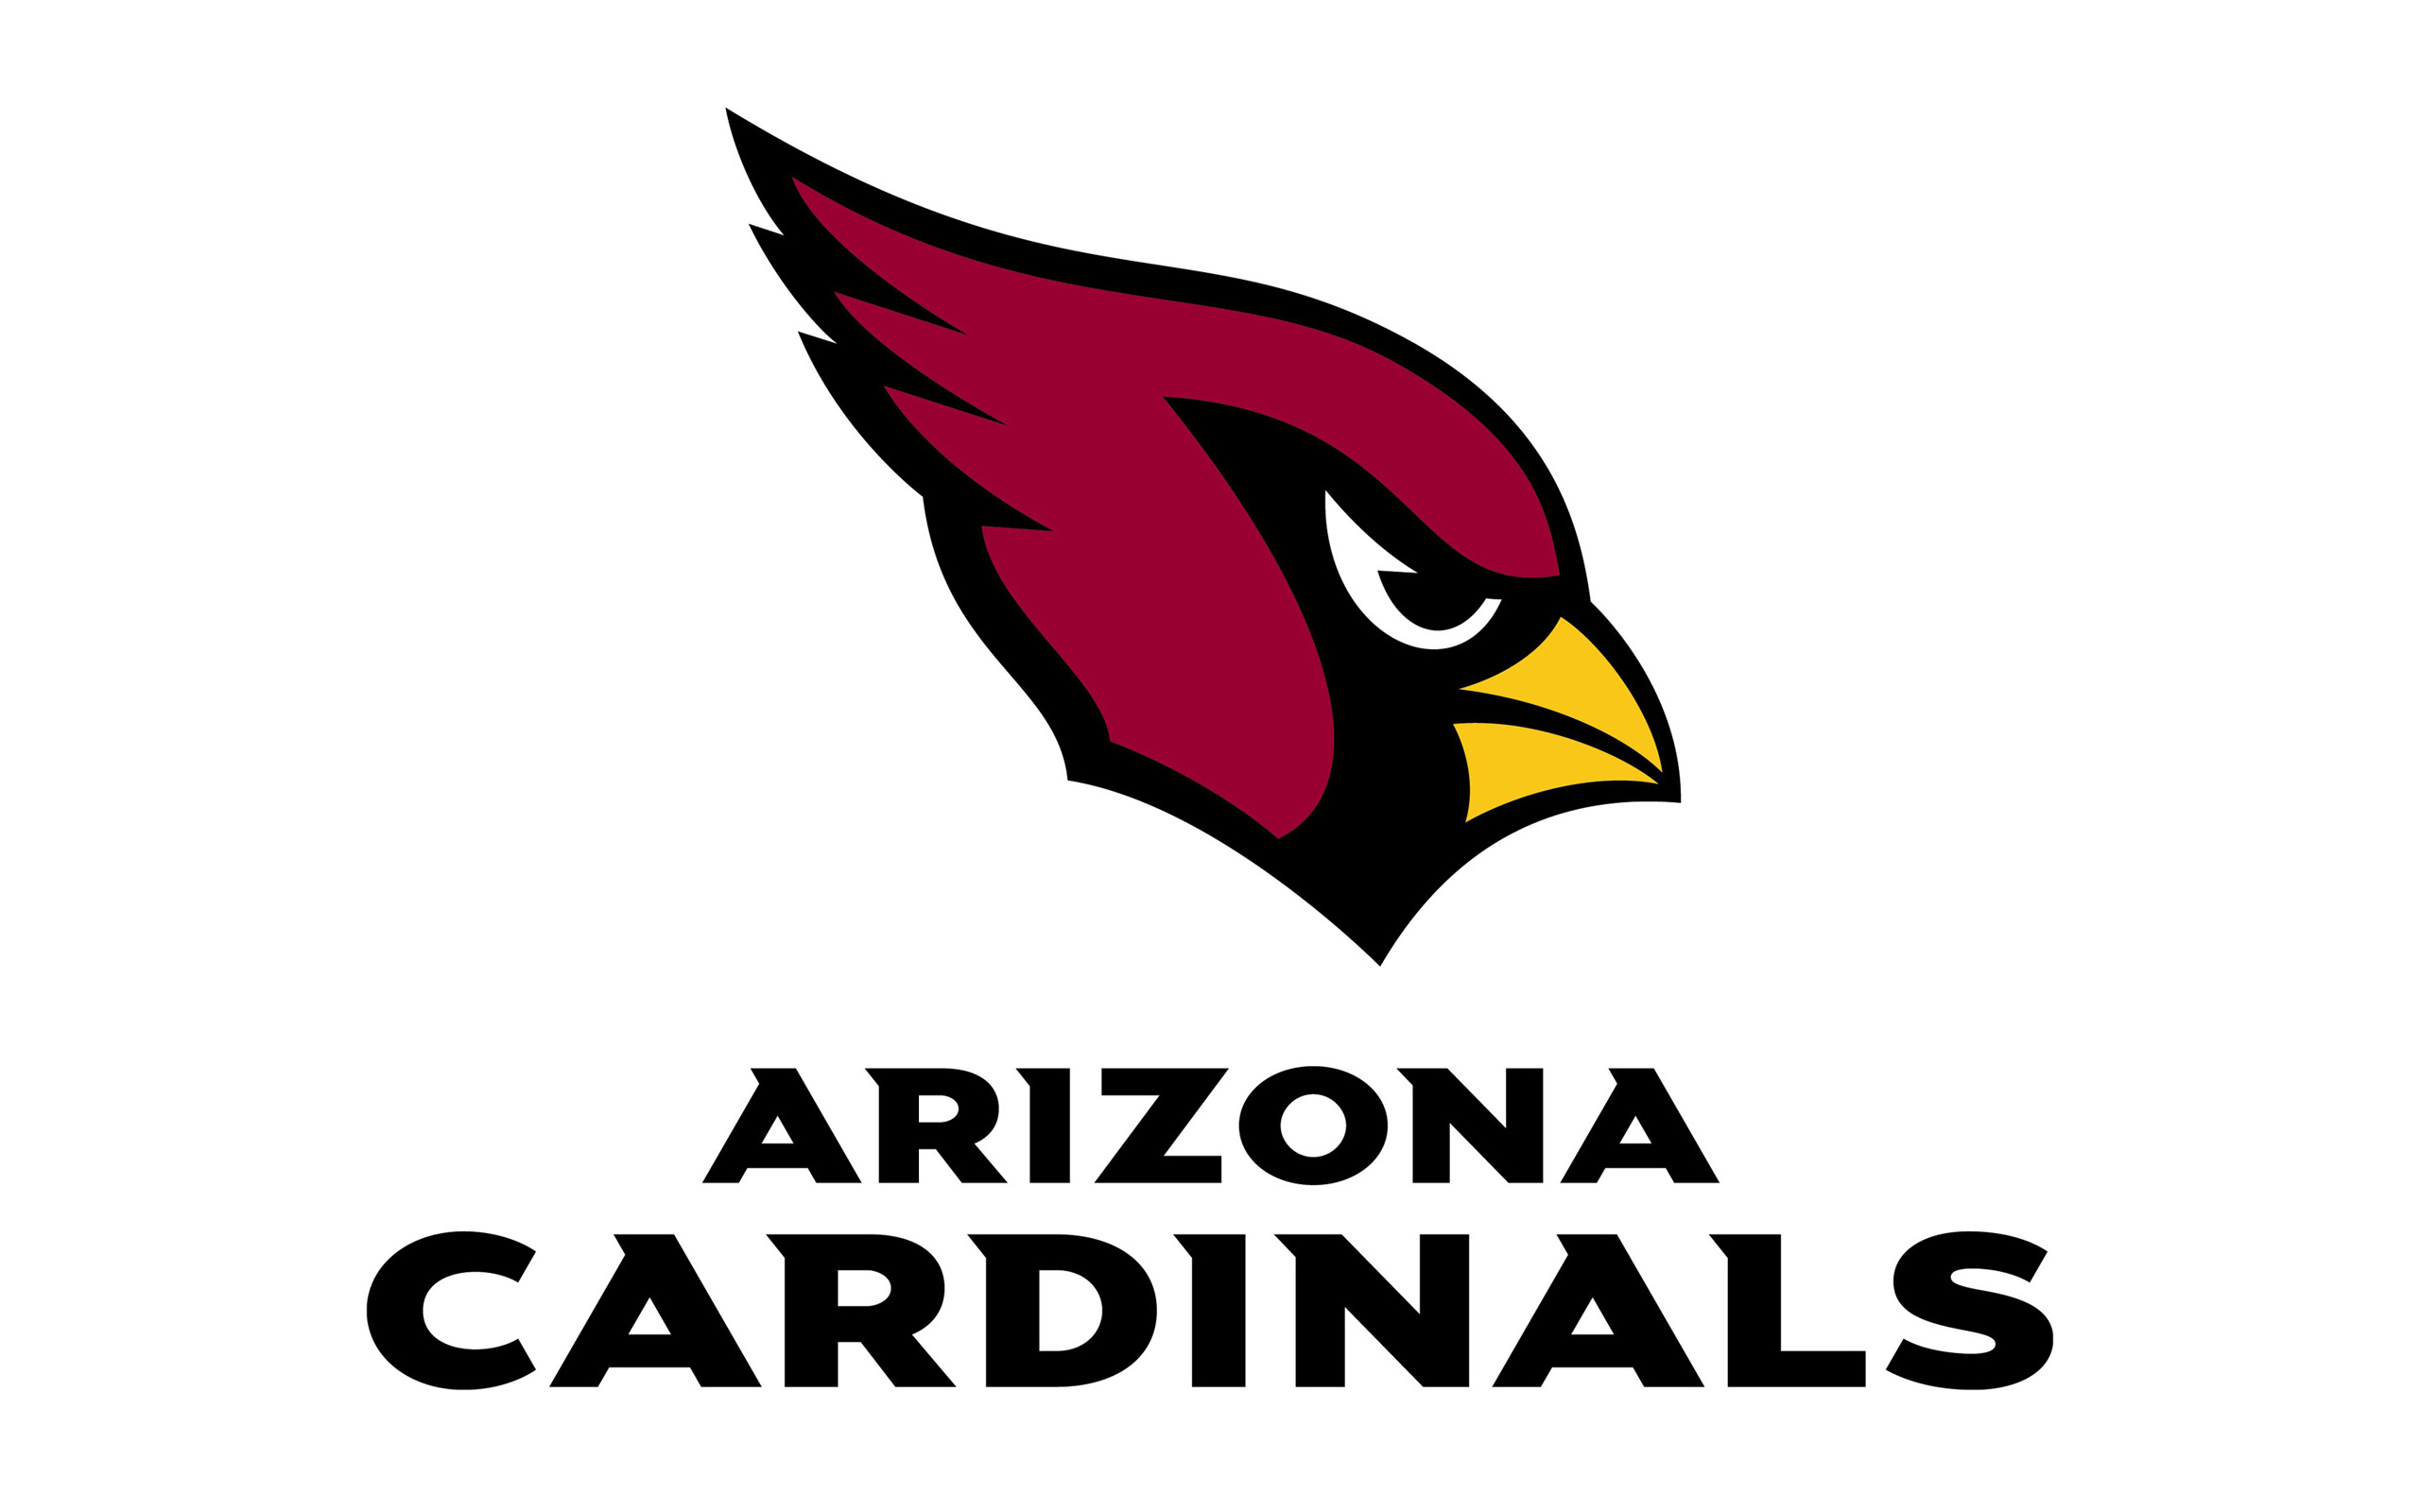 Receiver clipart arizona cardinals #12